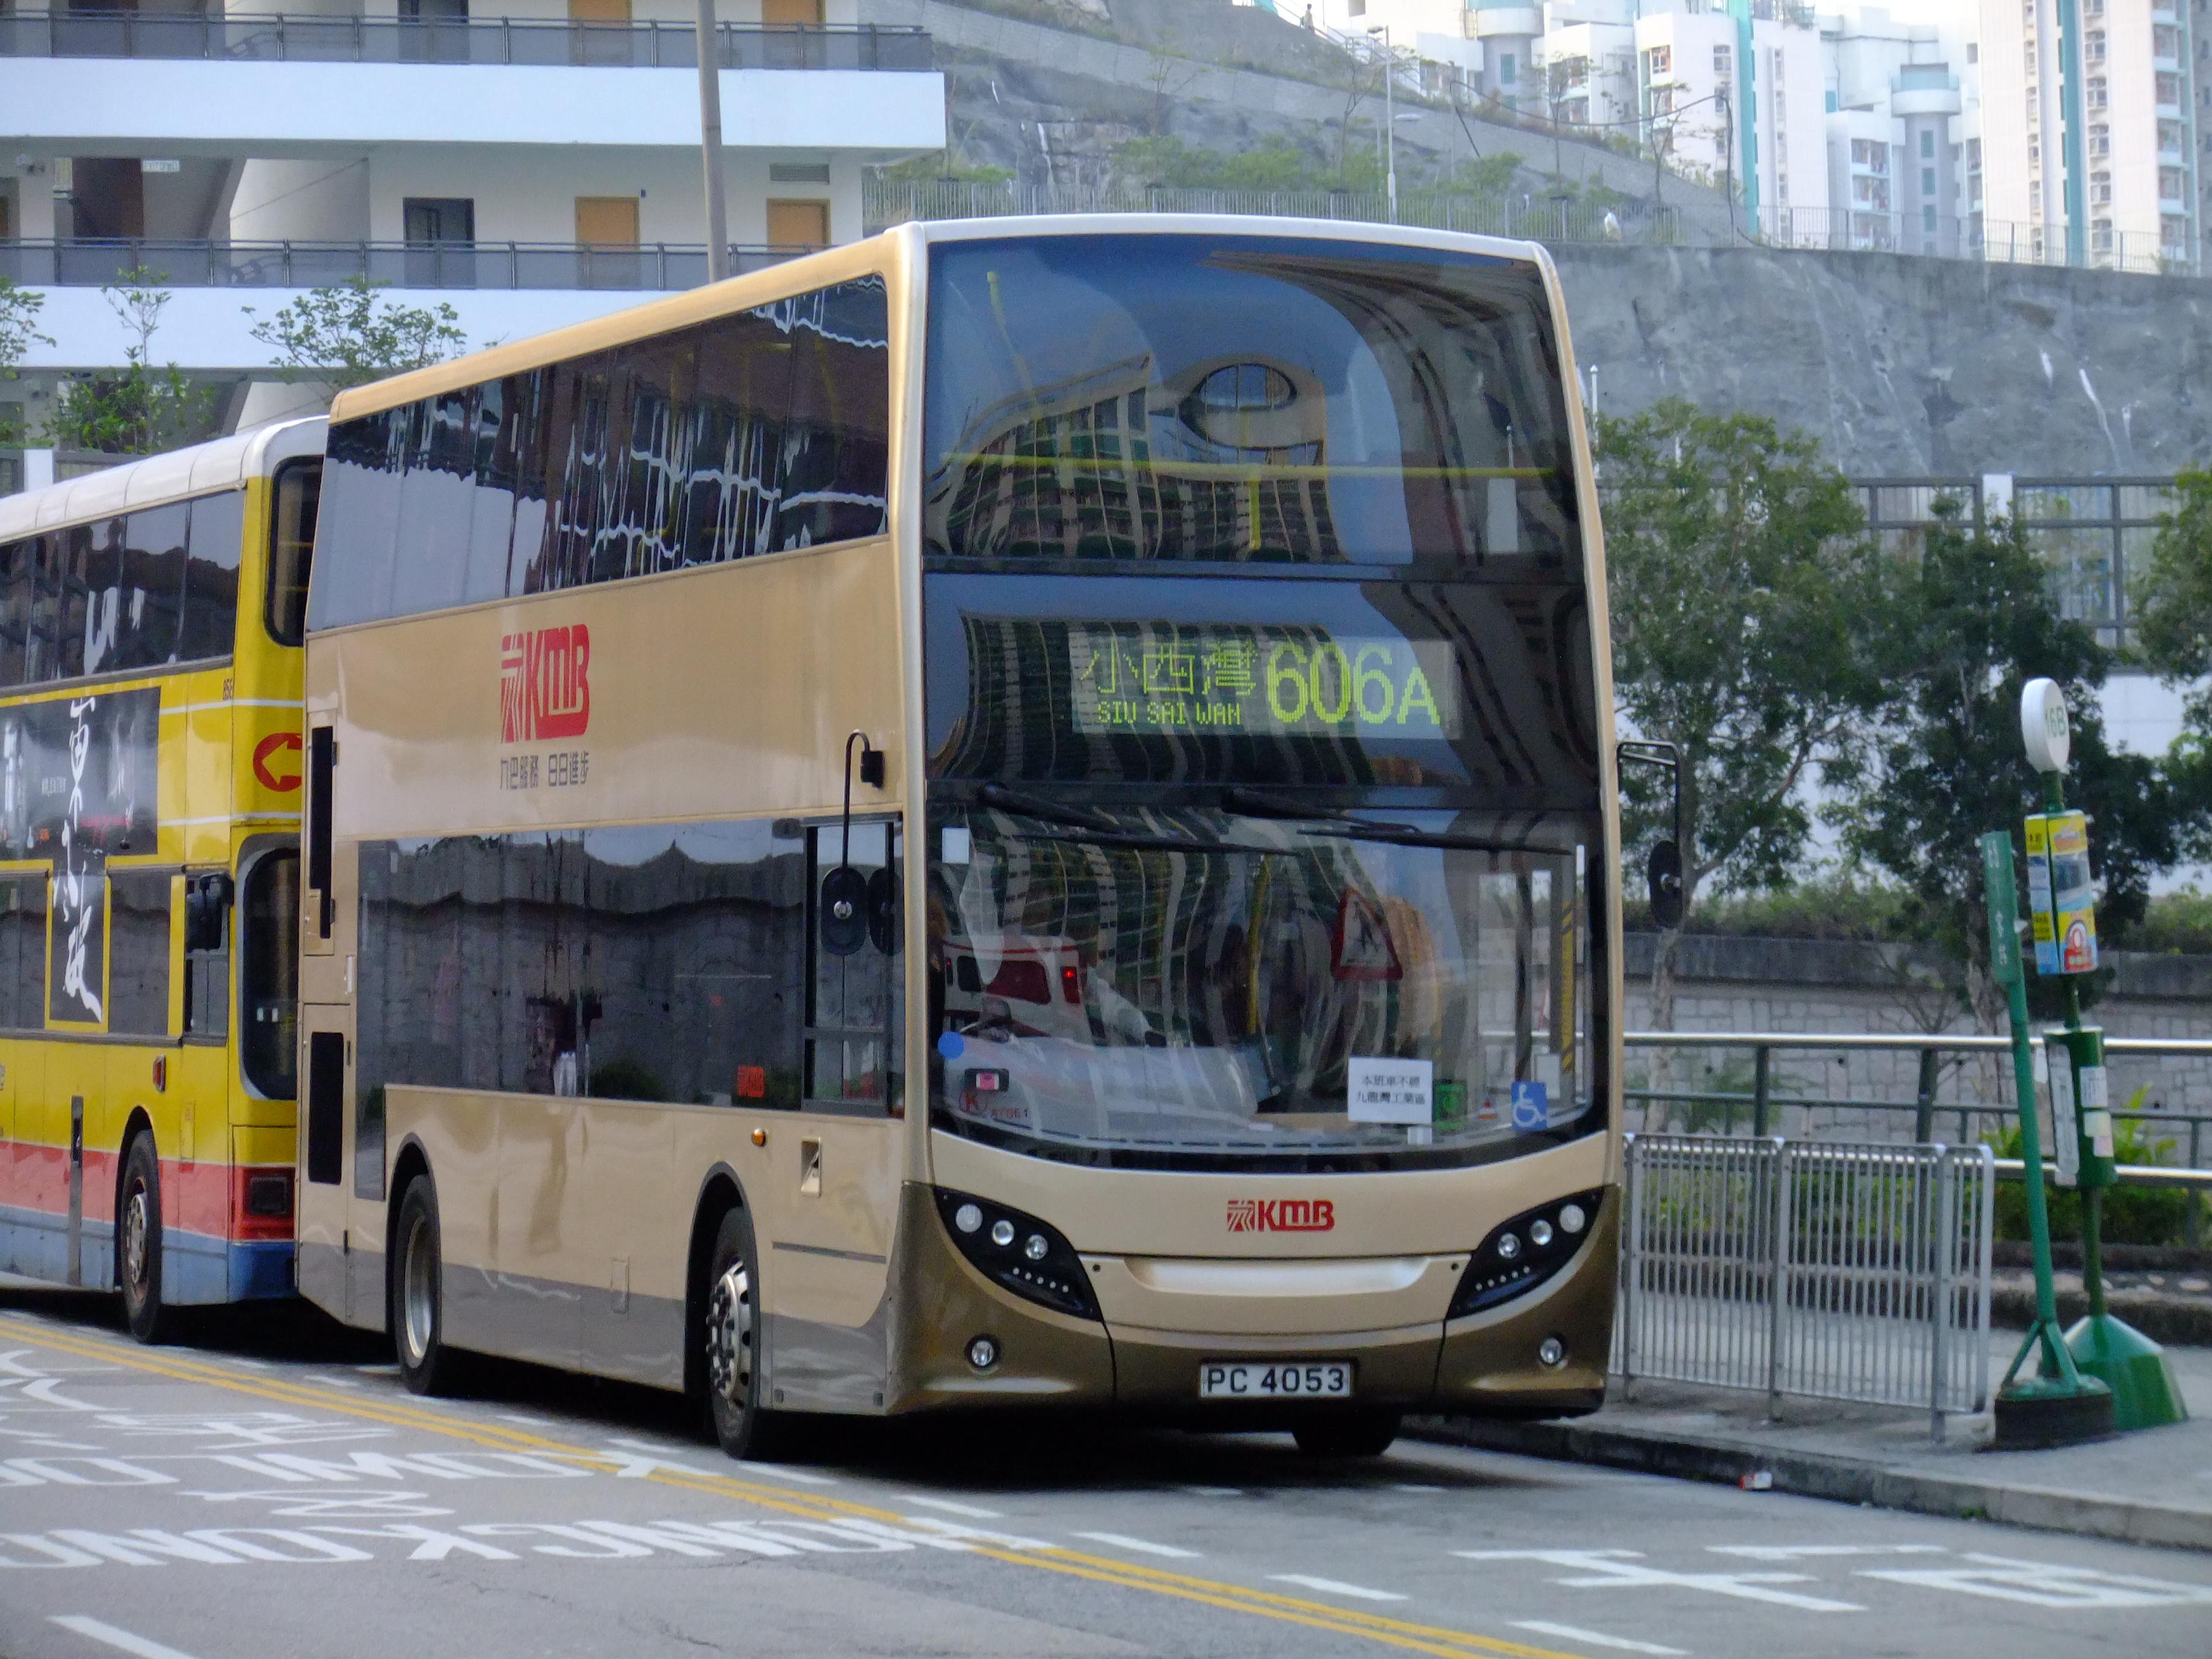 Scania K310ud Eldorado 102 A Sunny S Transport Pictures